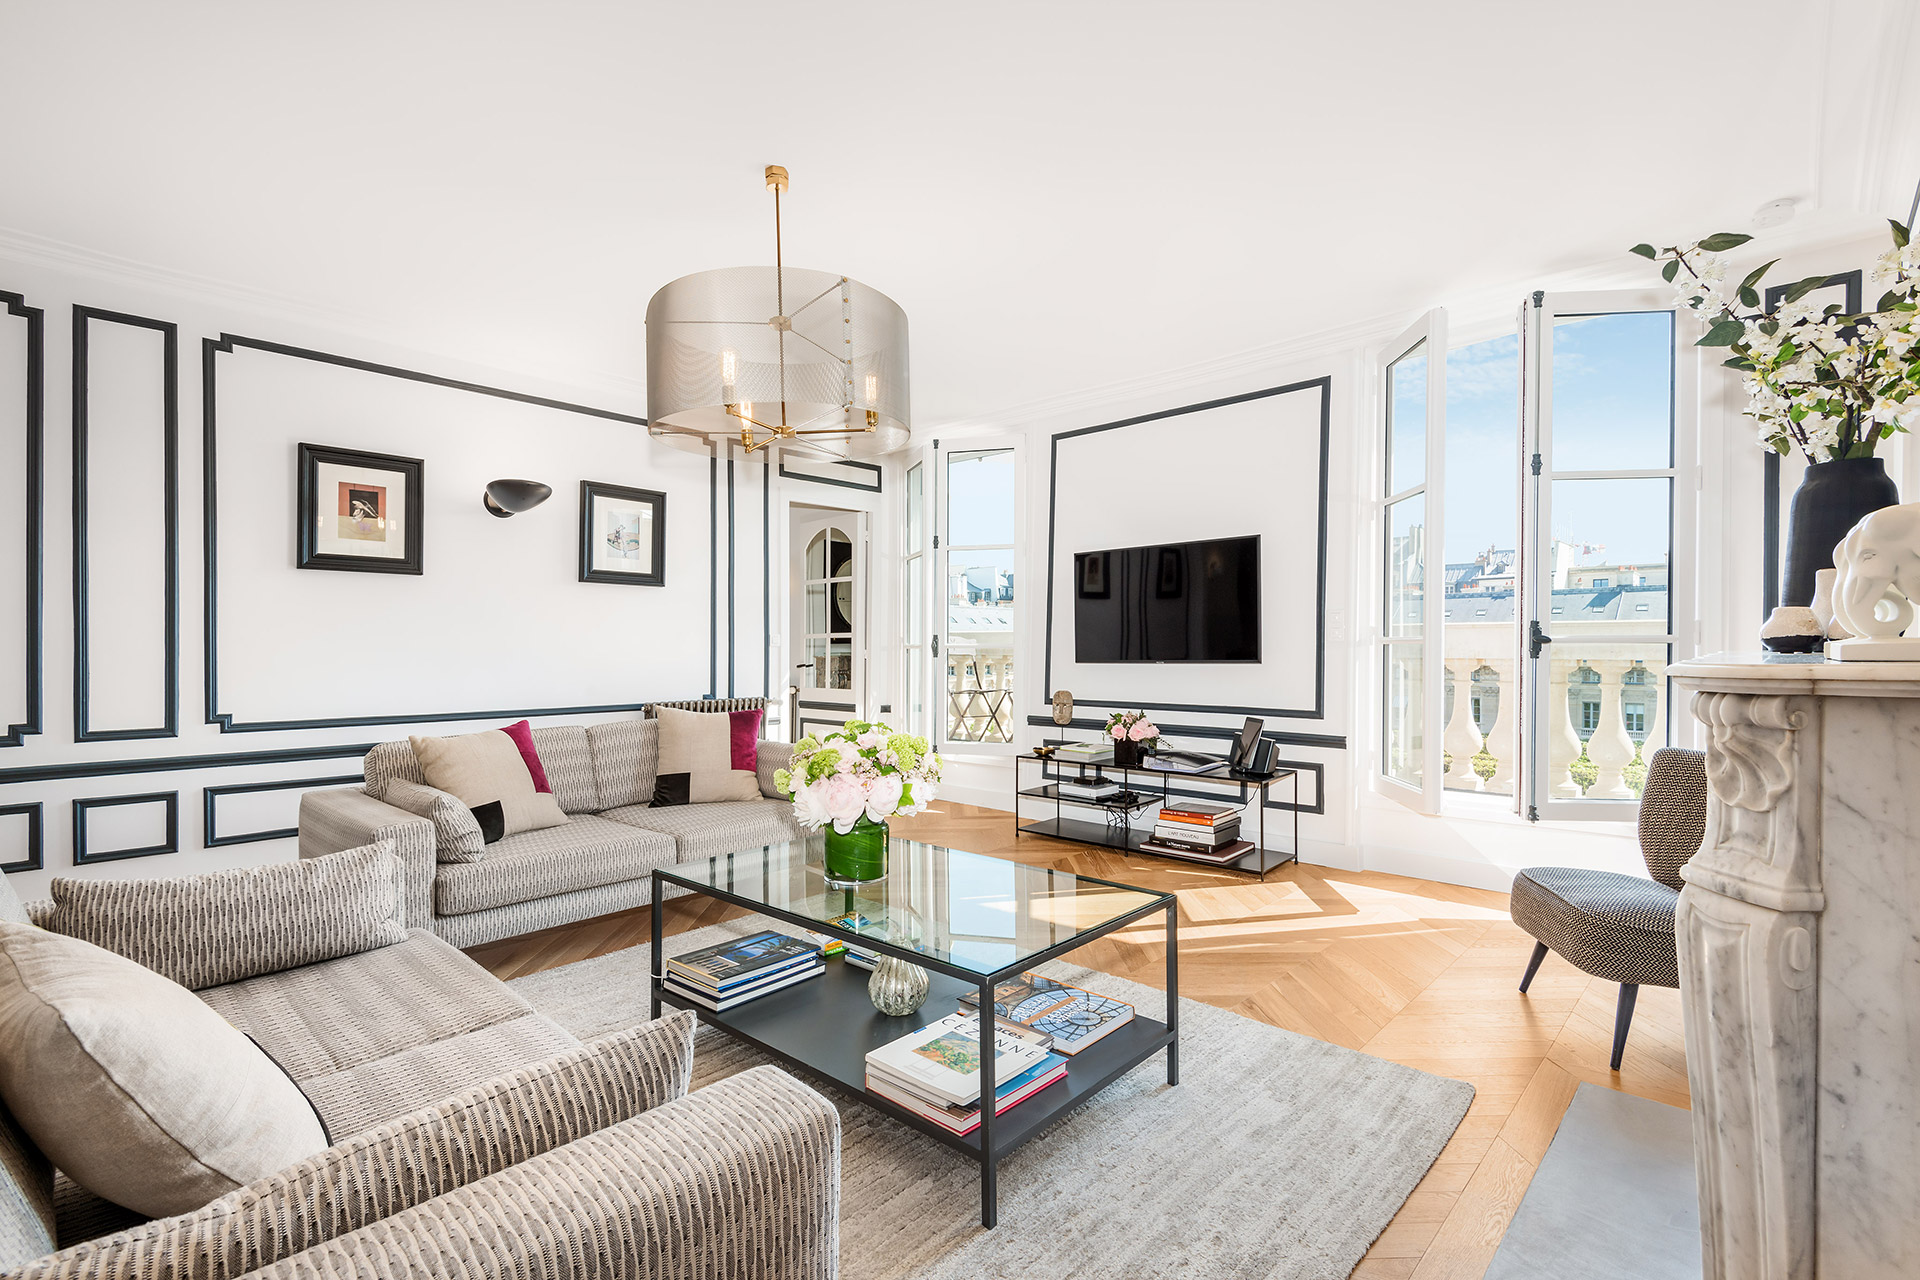 Chevalier duplex vacation rental by Paris Perfect